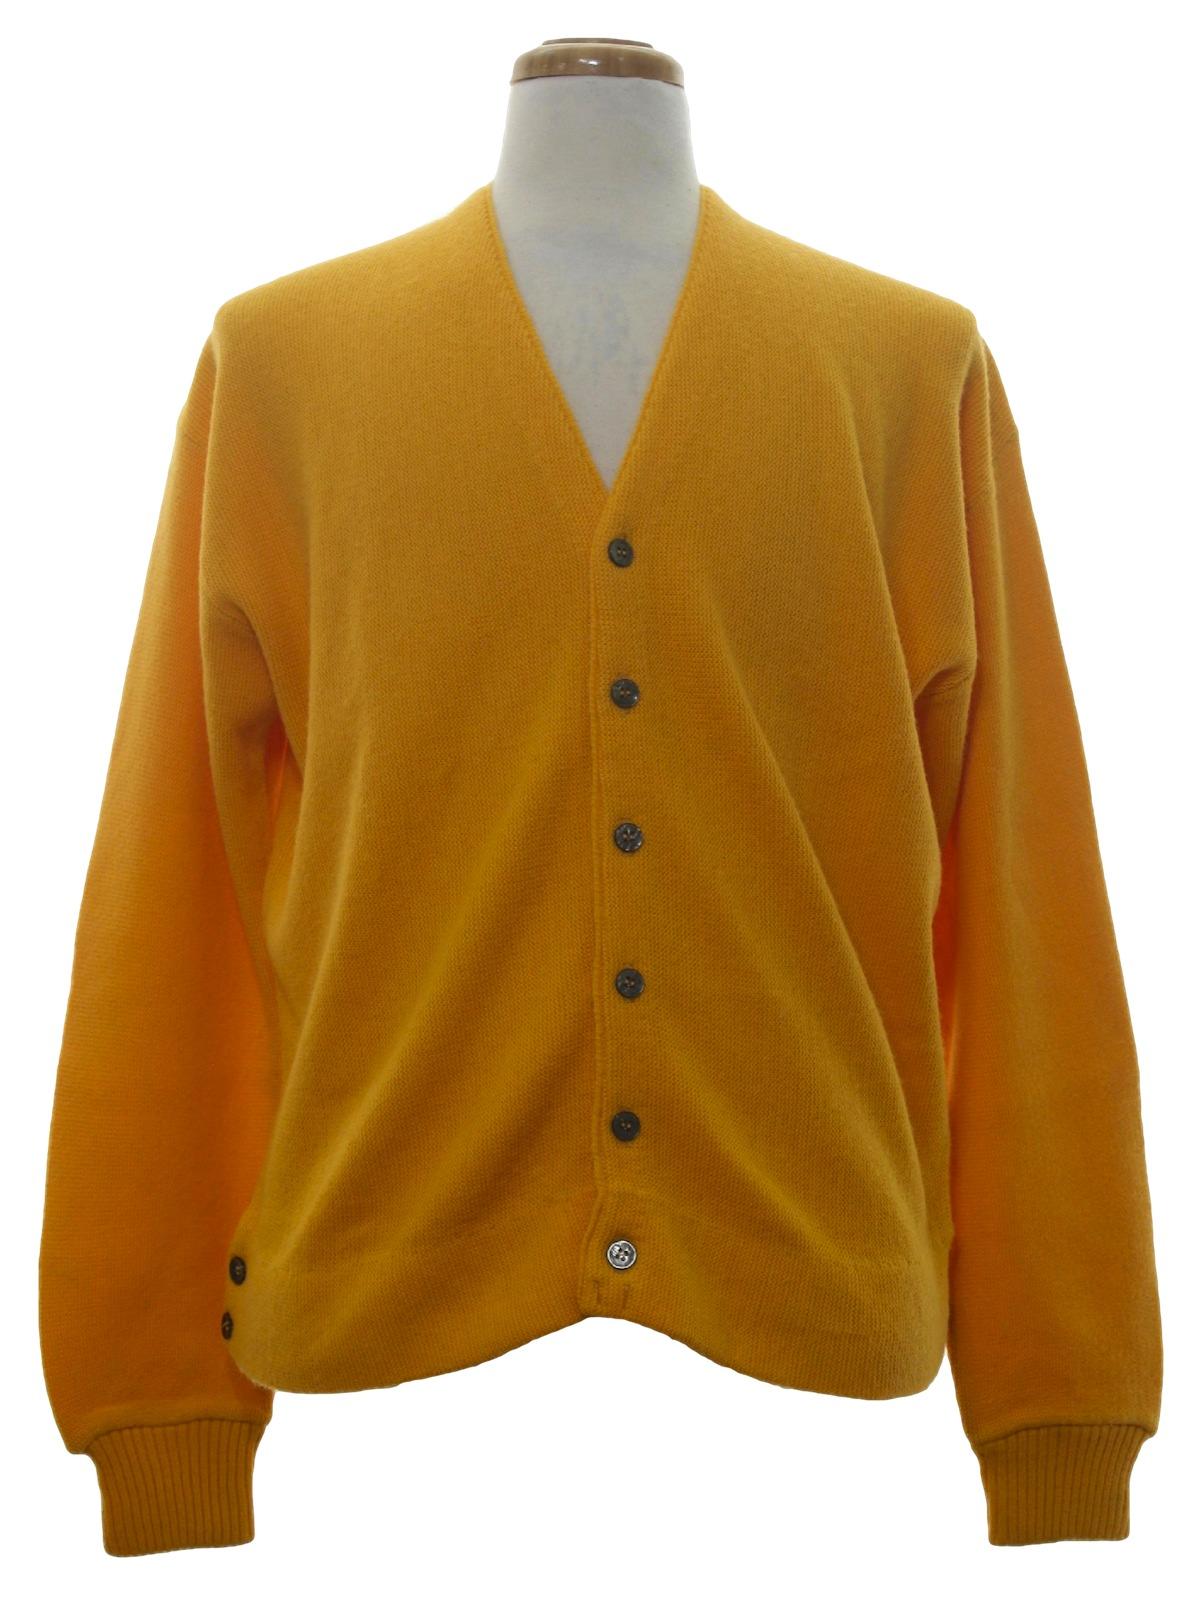 100 virgin acrylic orlon sweaters jpg 853x1280